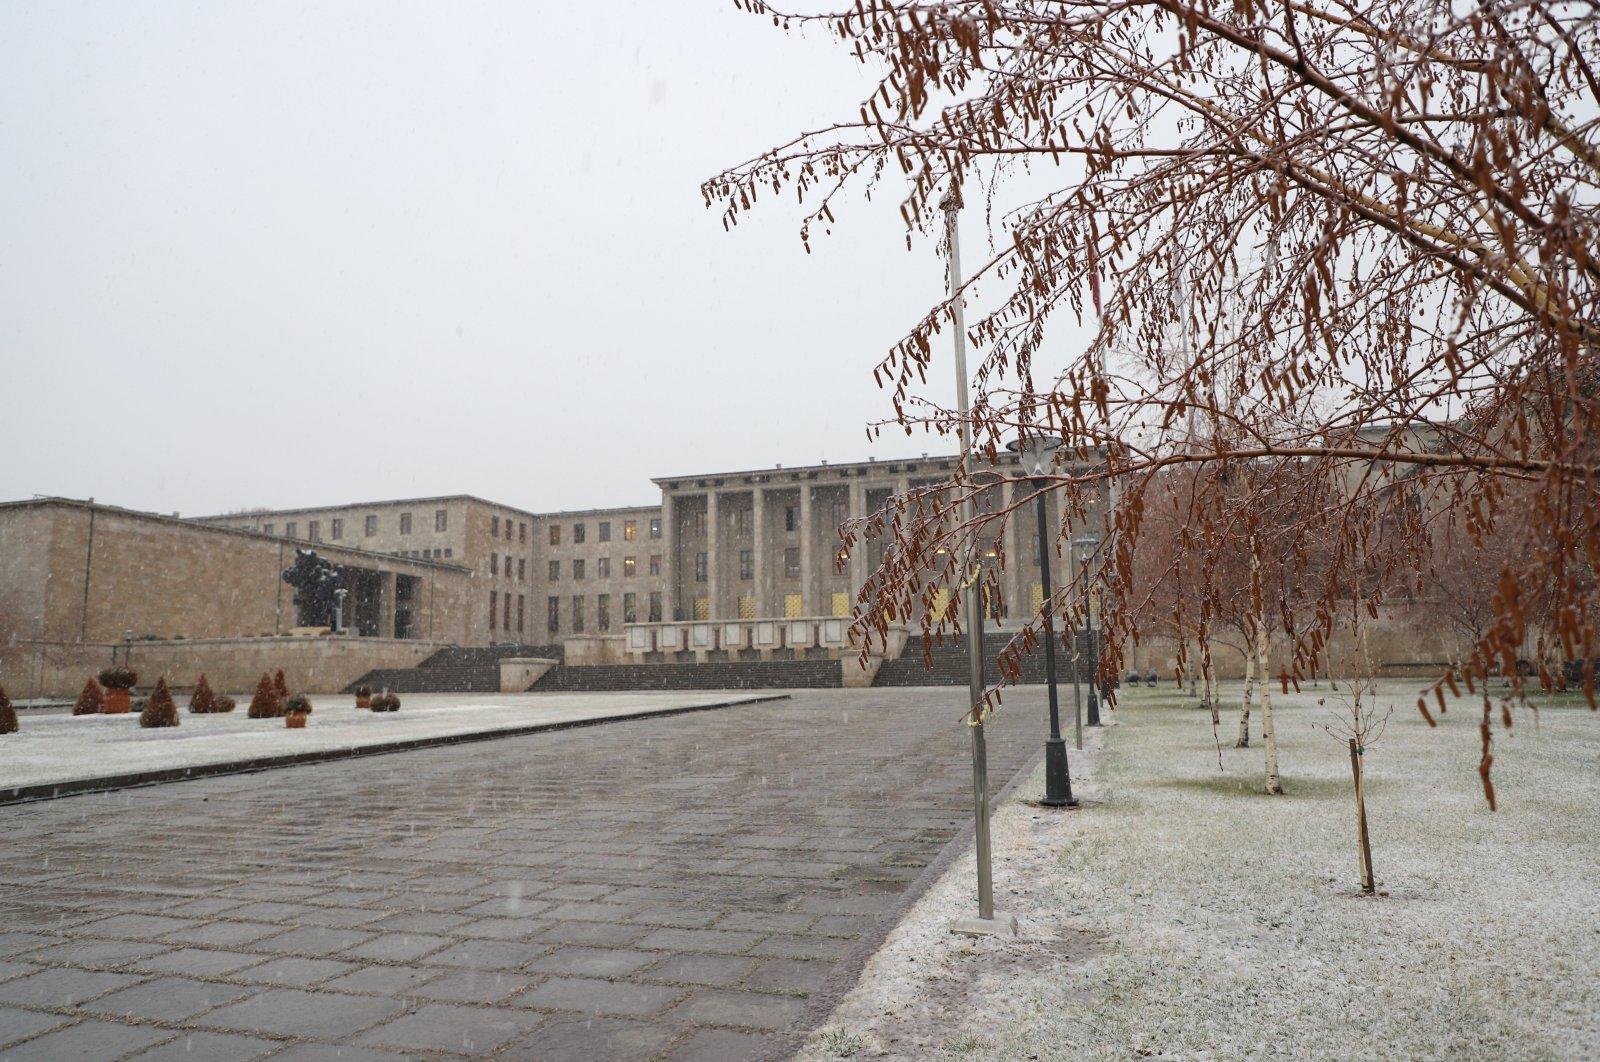 The Turkish Grand National Assembly (TBMM) is seen as snow falls in the capital Ankara, Turkey, Jan. 13, 2021. (AA Photo)